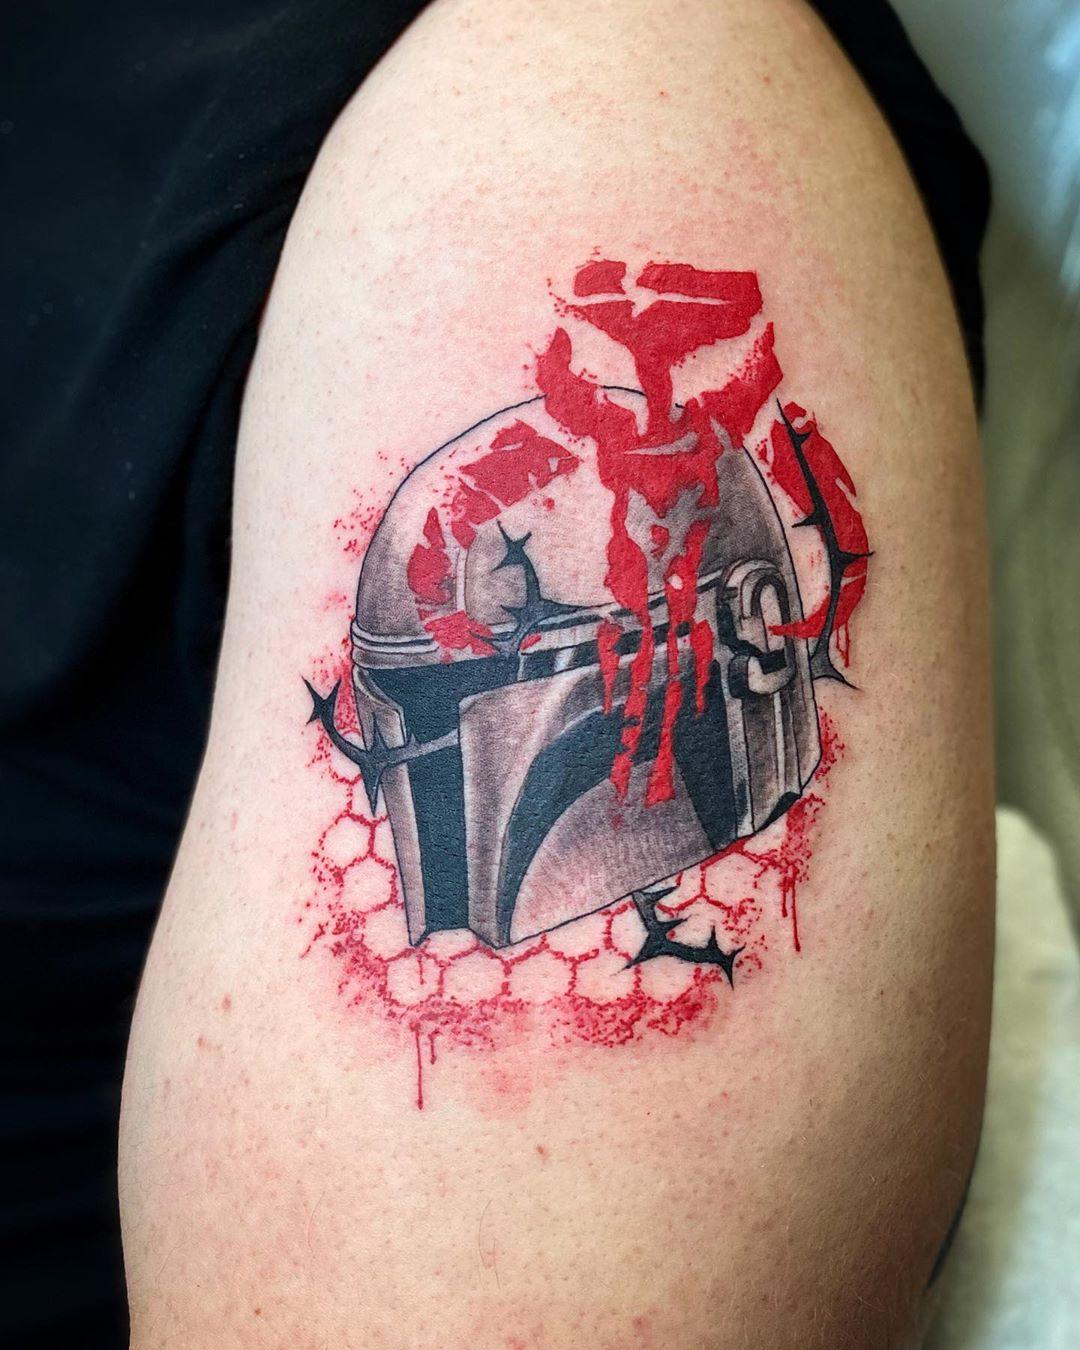 thorny Mandalorian tattoo